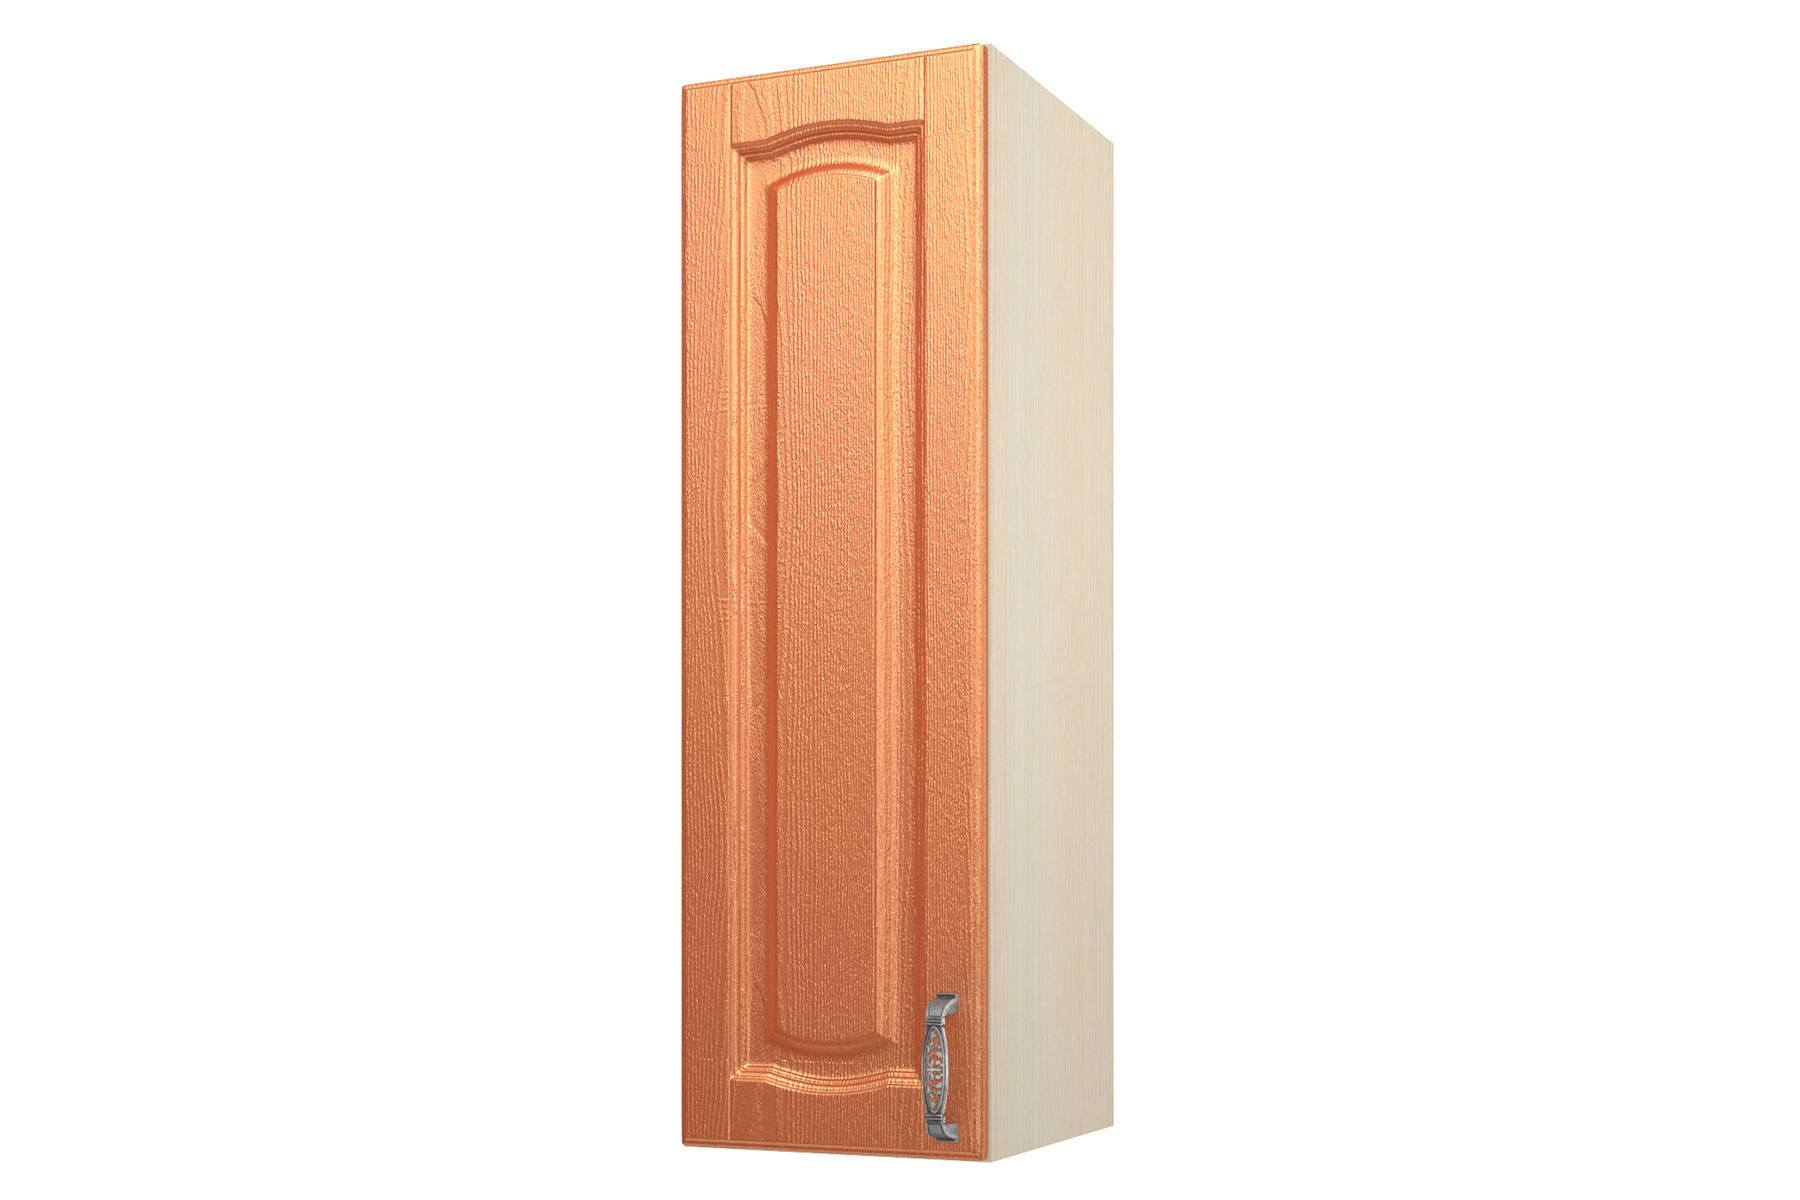 Равенна ART Шкаф навесной 30 (Н-96), 1 дверь равенна art шкаф навесной 40 н 96 1 дверь